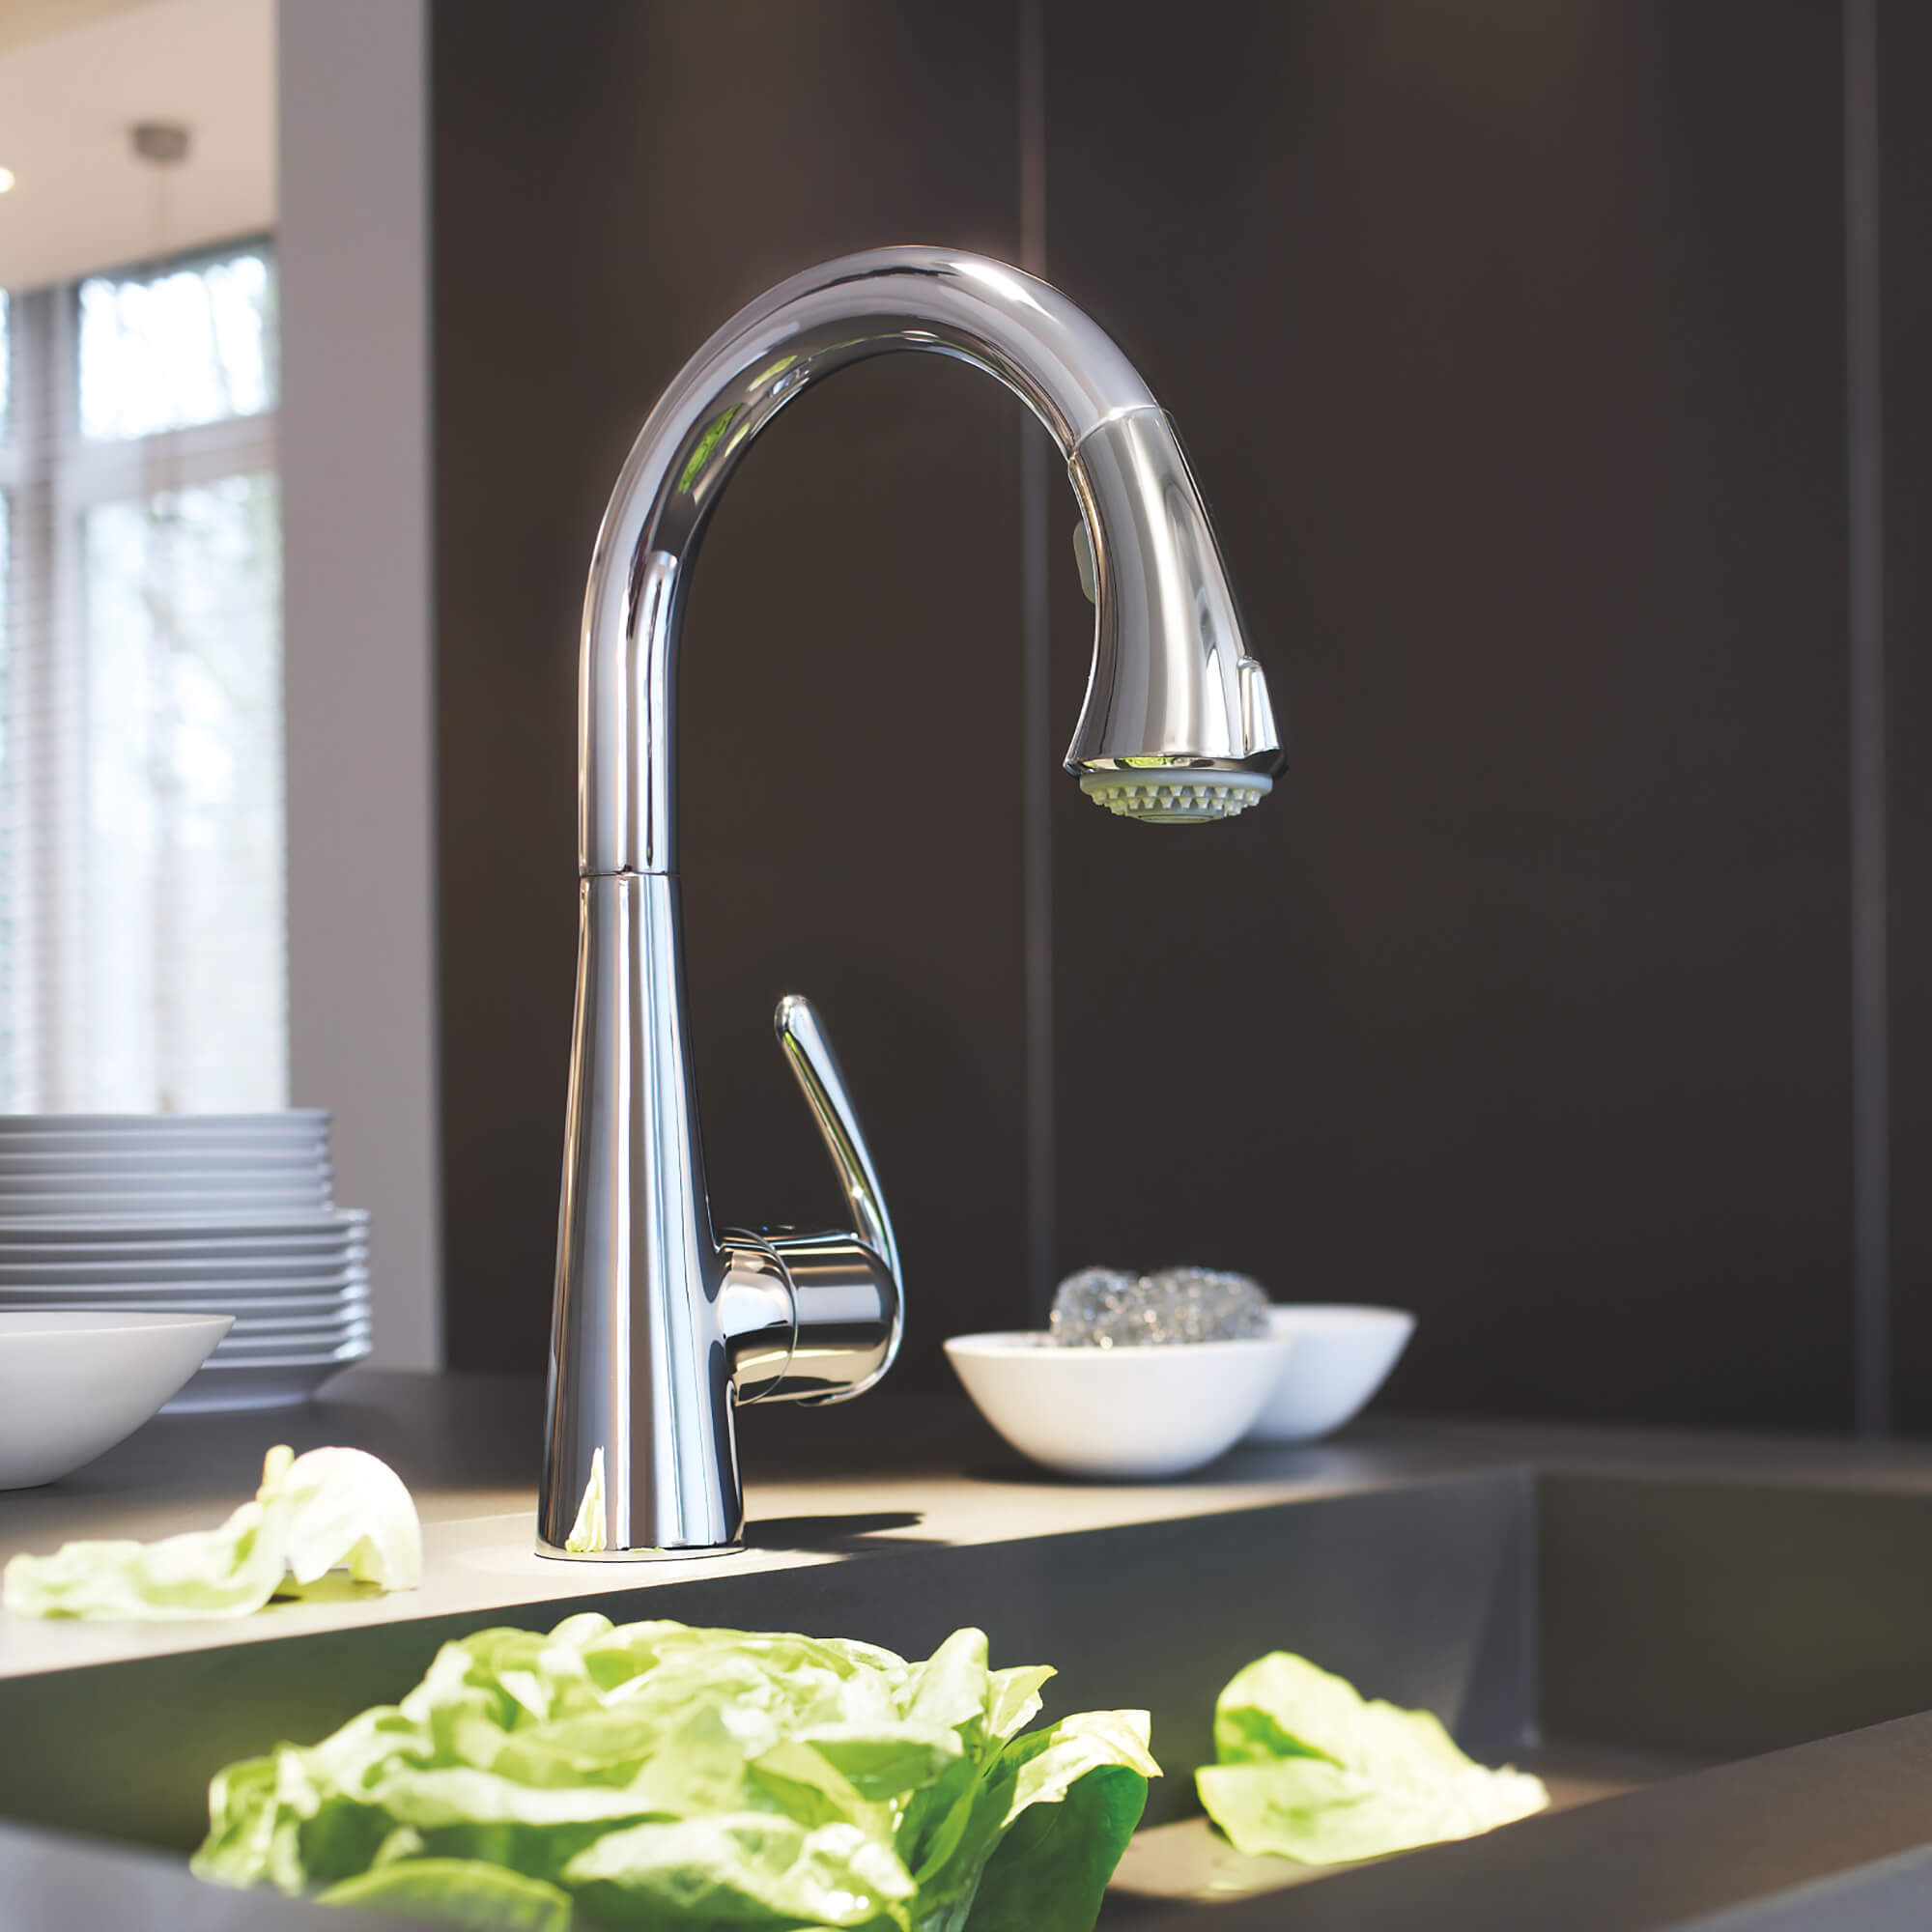 GROHE LadyLux3 kitchen faucet